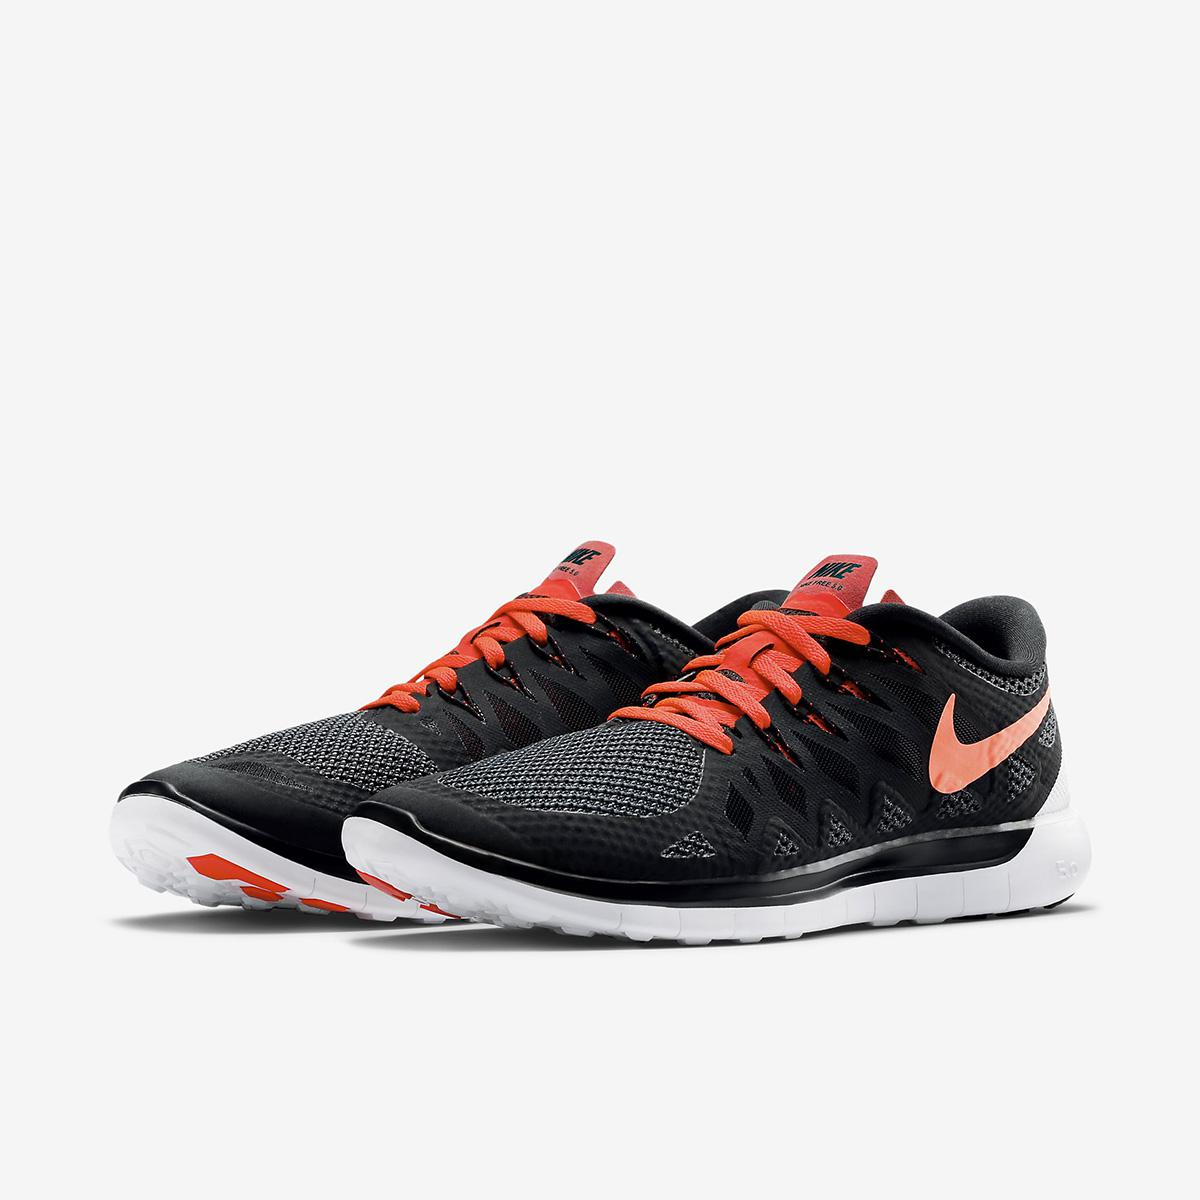 Nike Mens Free 5.0+ Running Shoes - Black/Bright Crimson